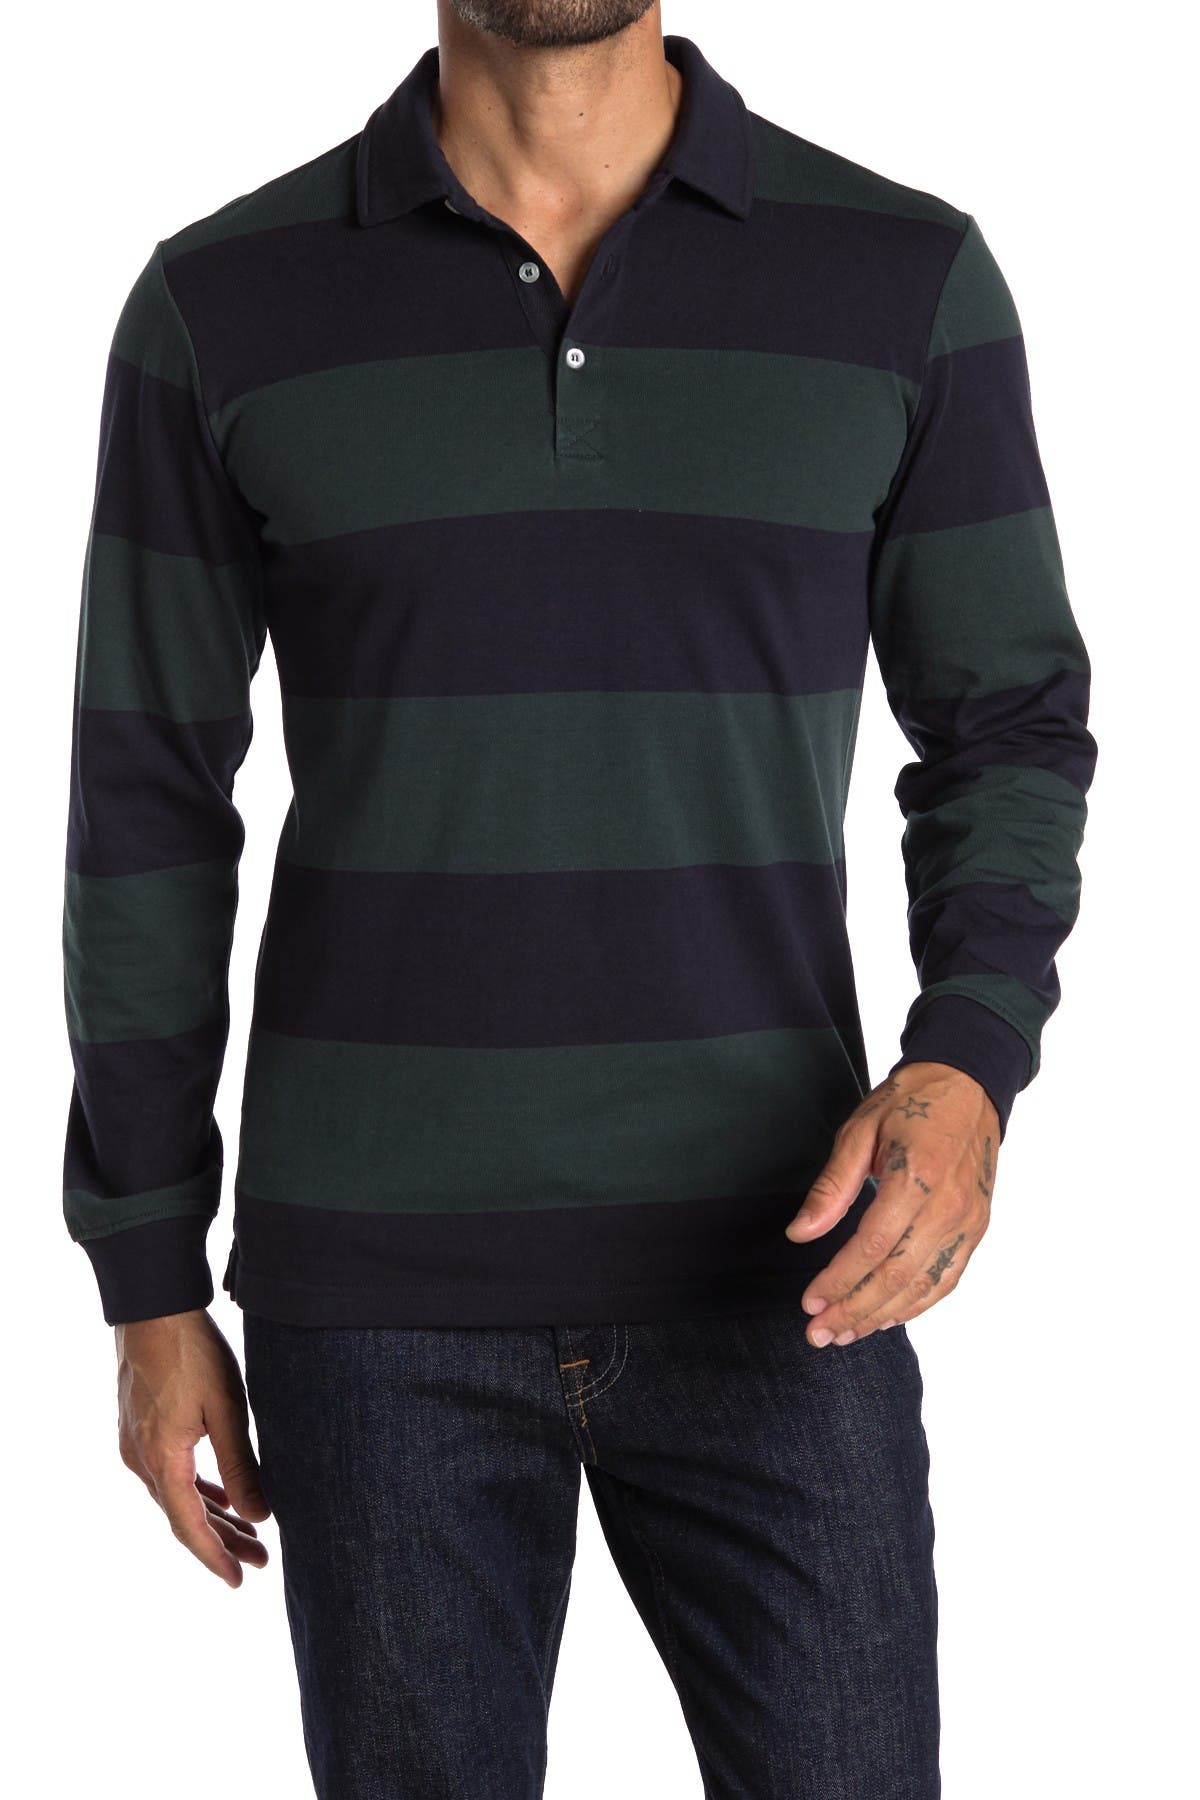 Image of Slate & Stone Rugby Stripe Long Sleeve Polo